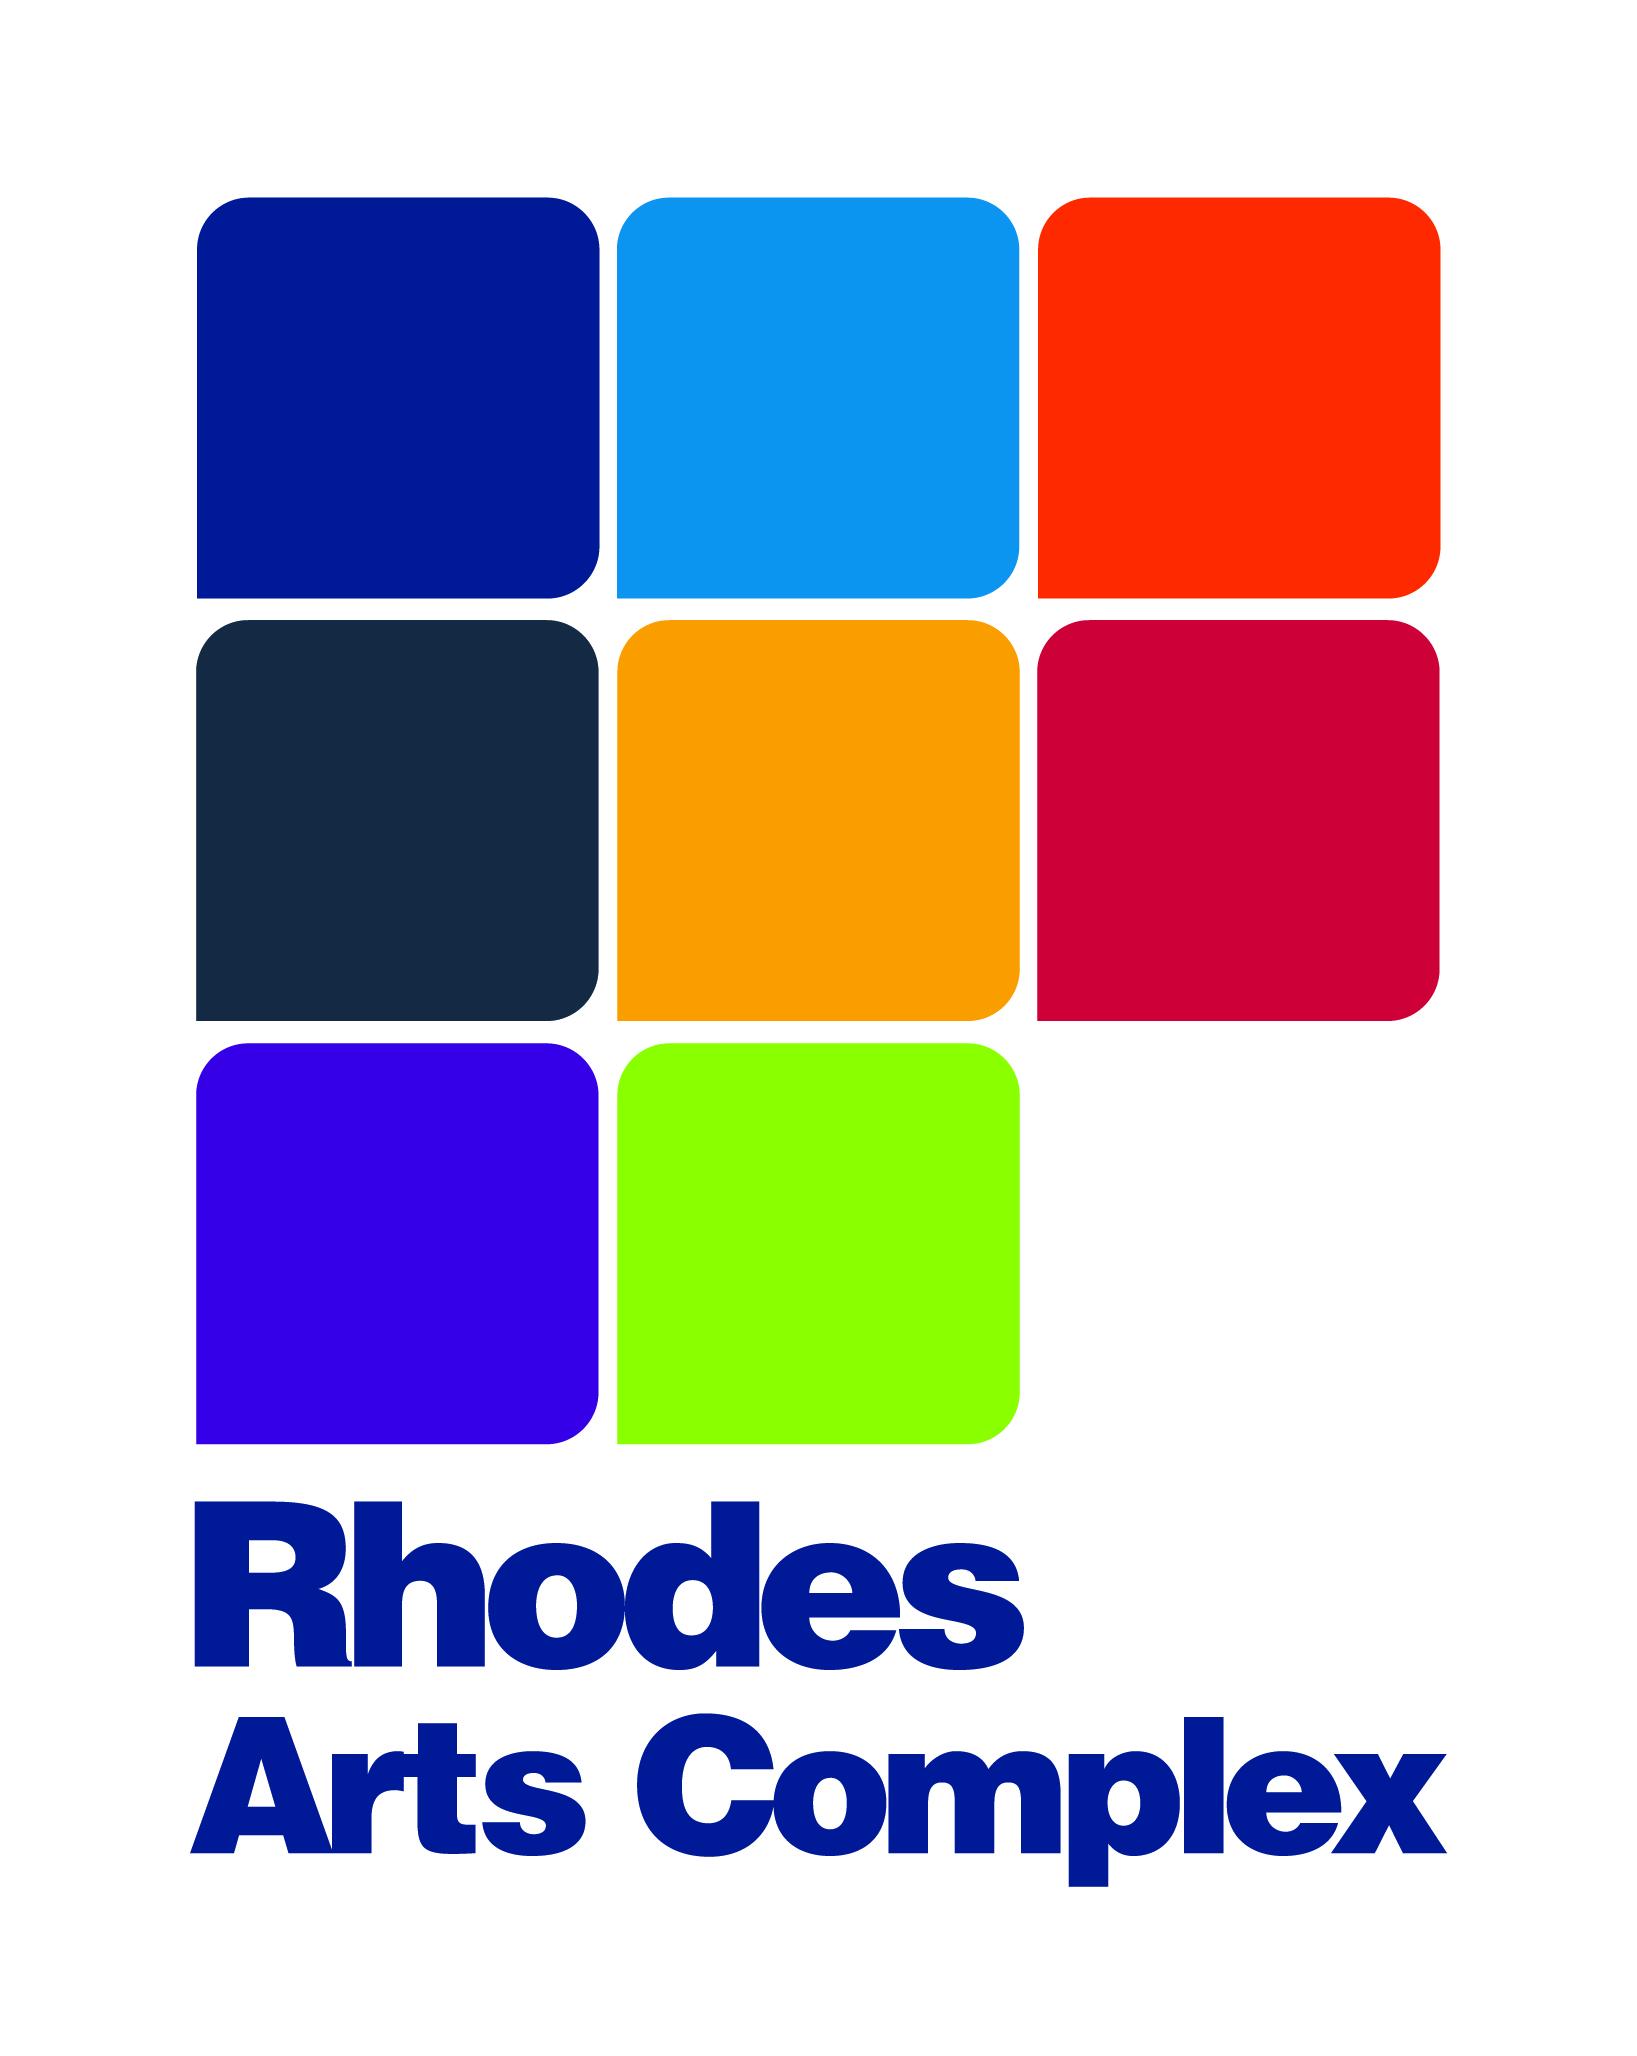 Rhodes Arts Complex map